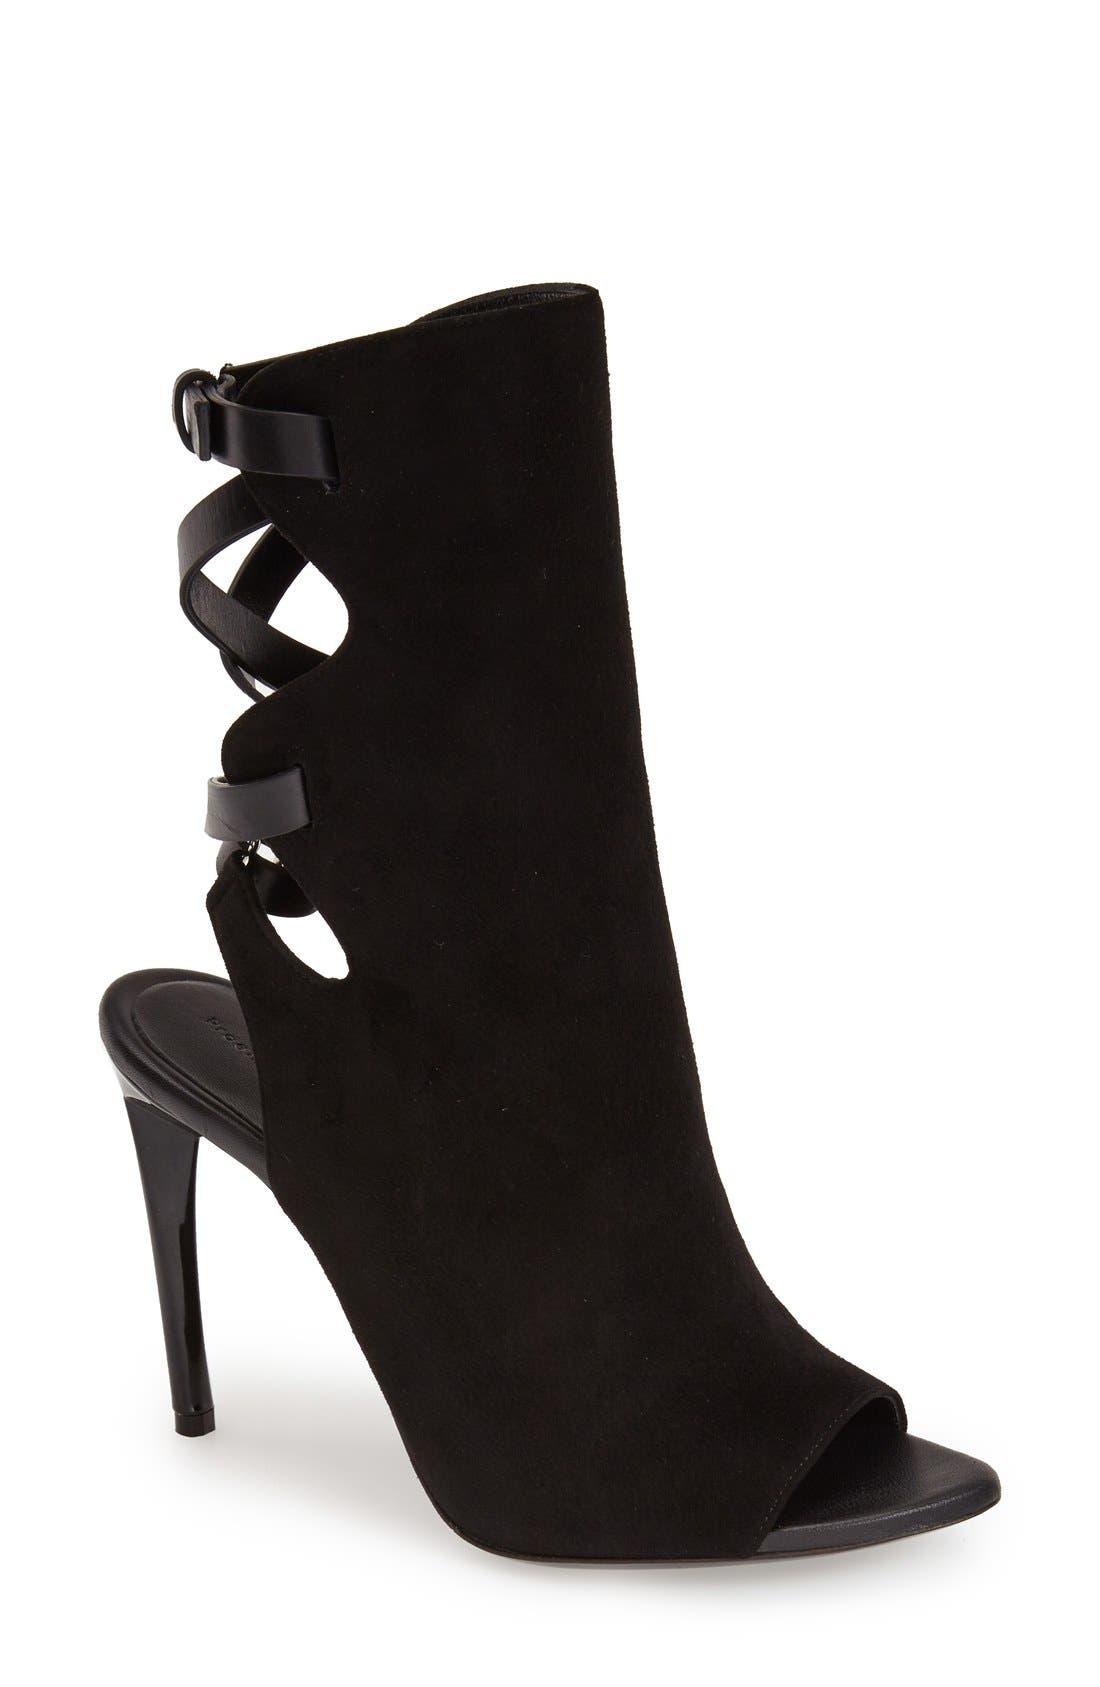 Main Image - Proenza Schouler 'Selvino' Peep Toe Boot (Women)